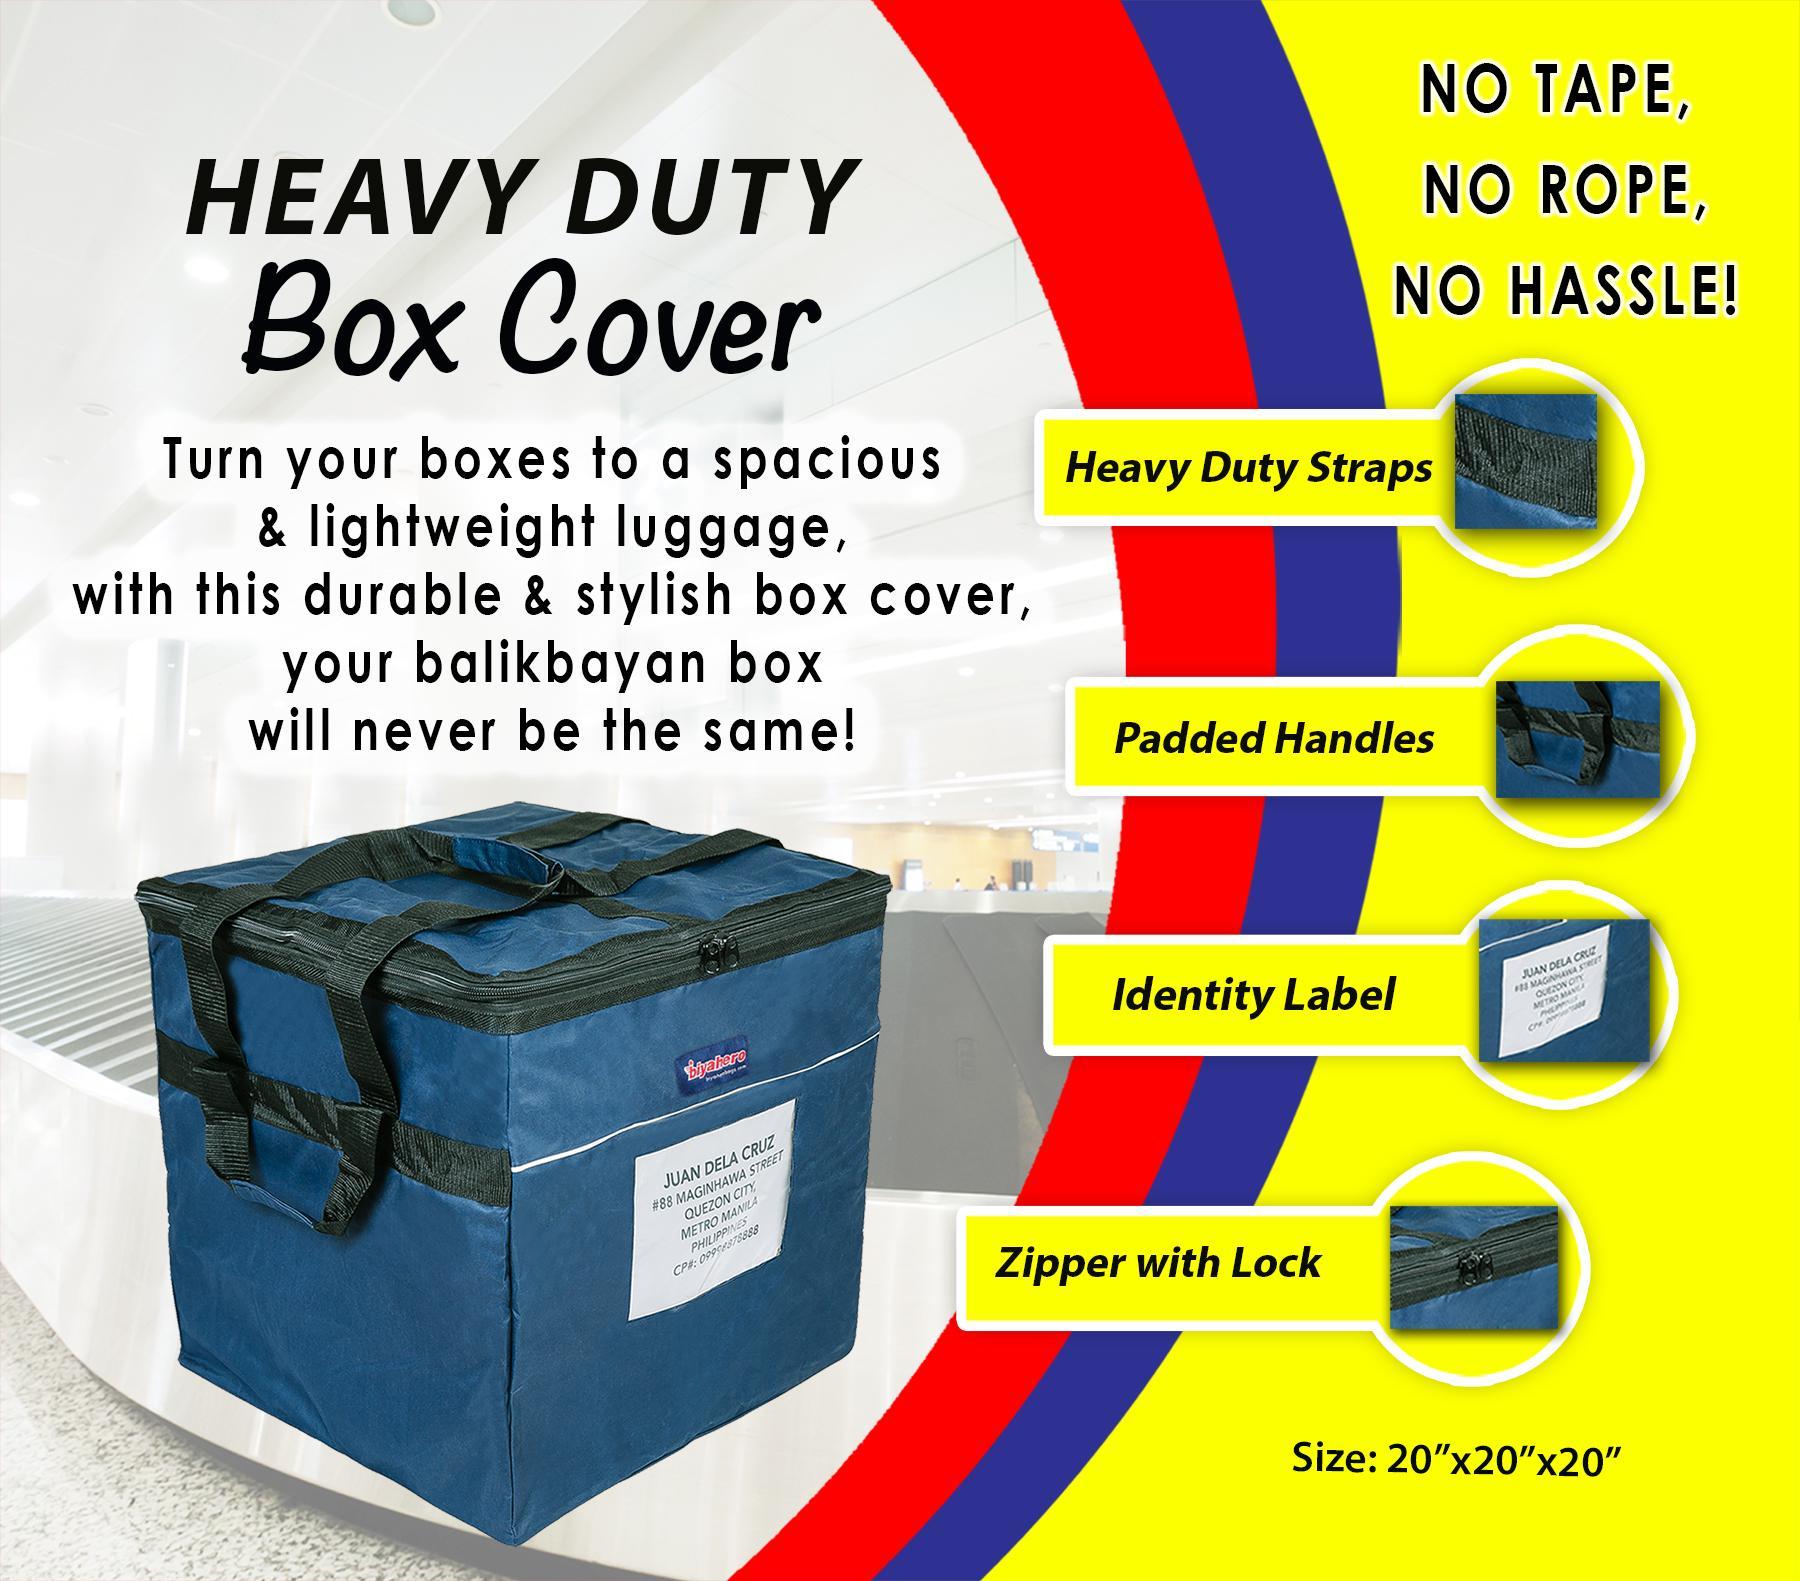 Heavy Duty Balikbayan Box Cover 20